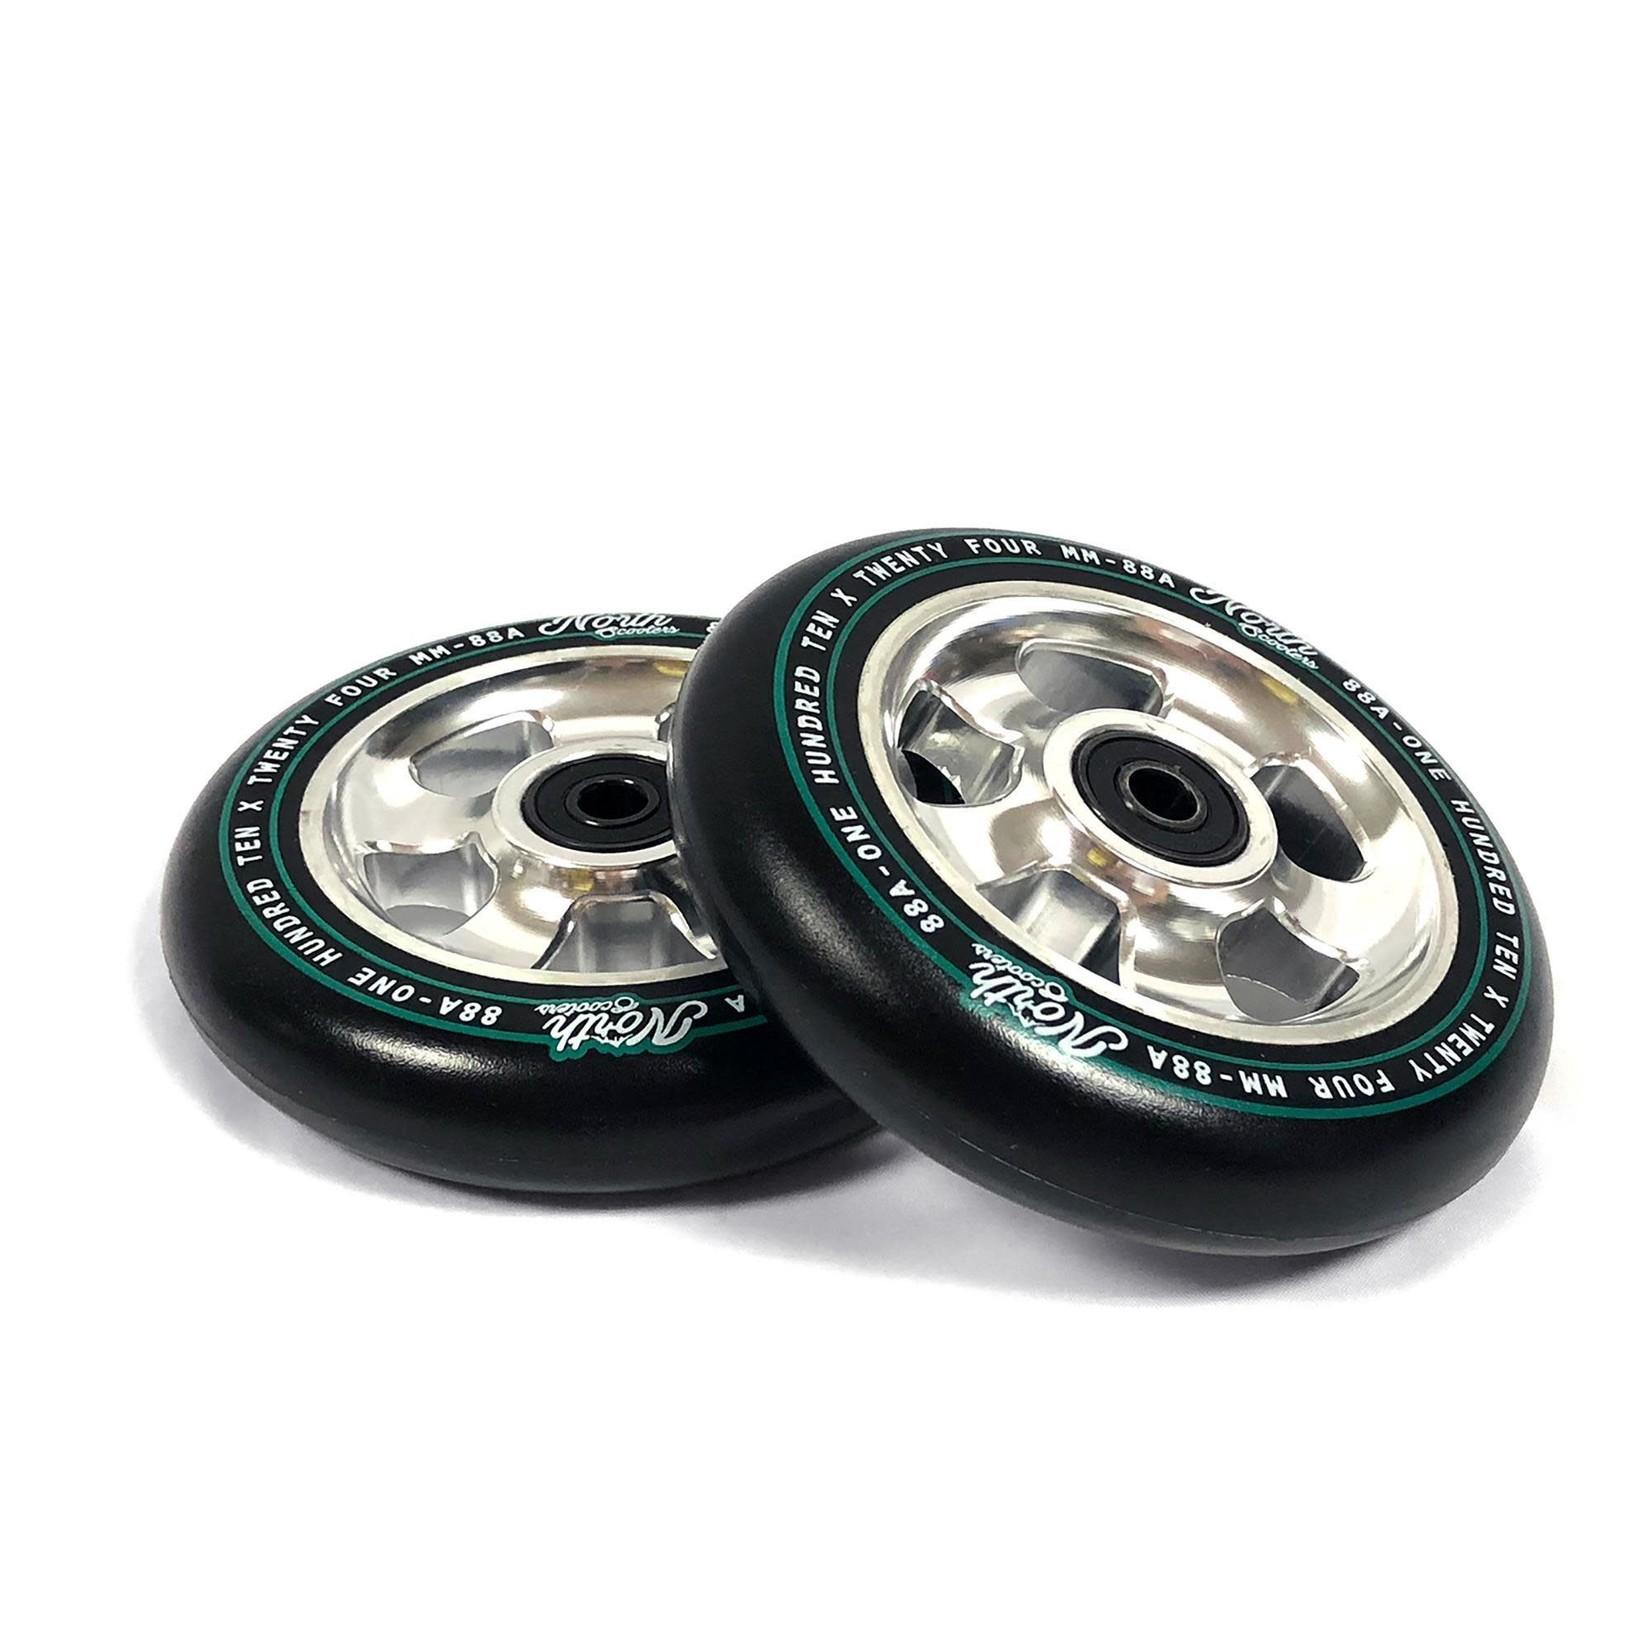 North North - HQ Wheels - 110 x 24mm - Black / Silver